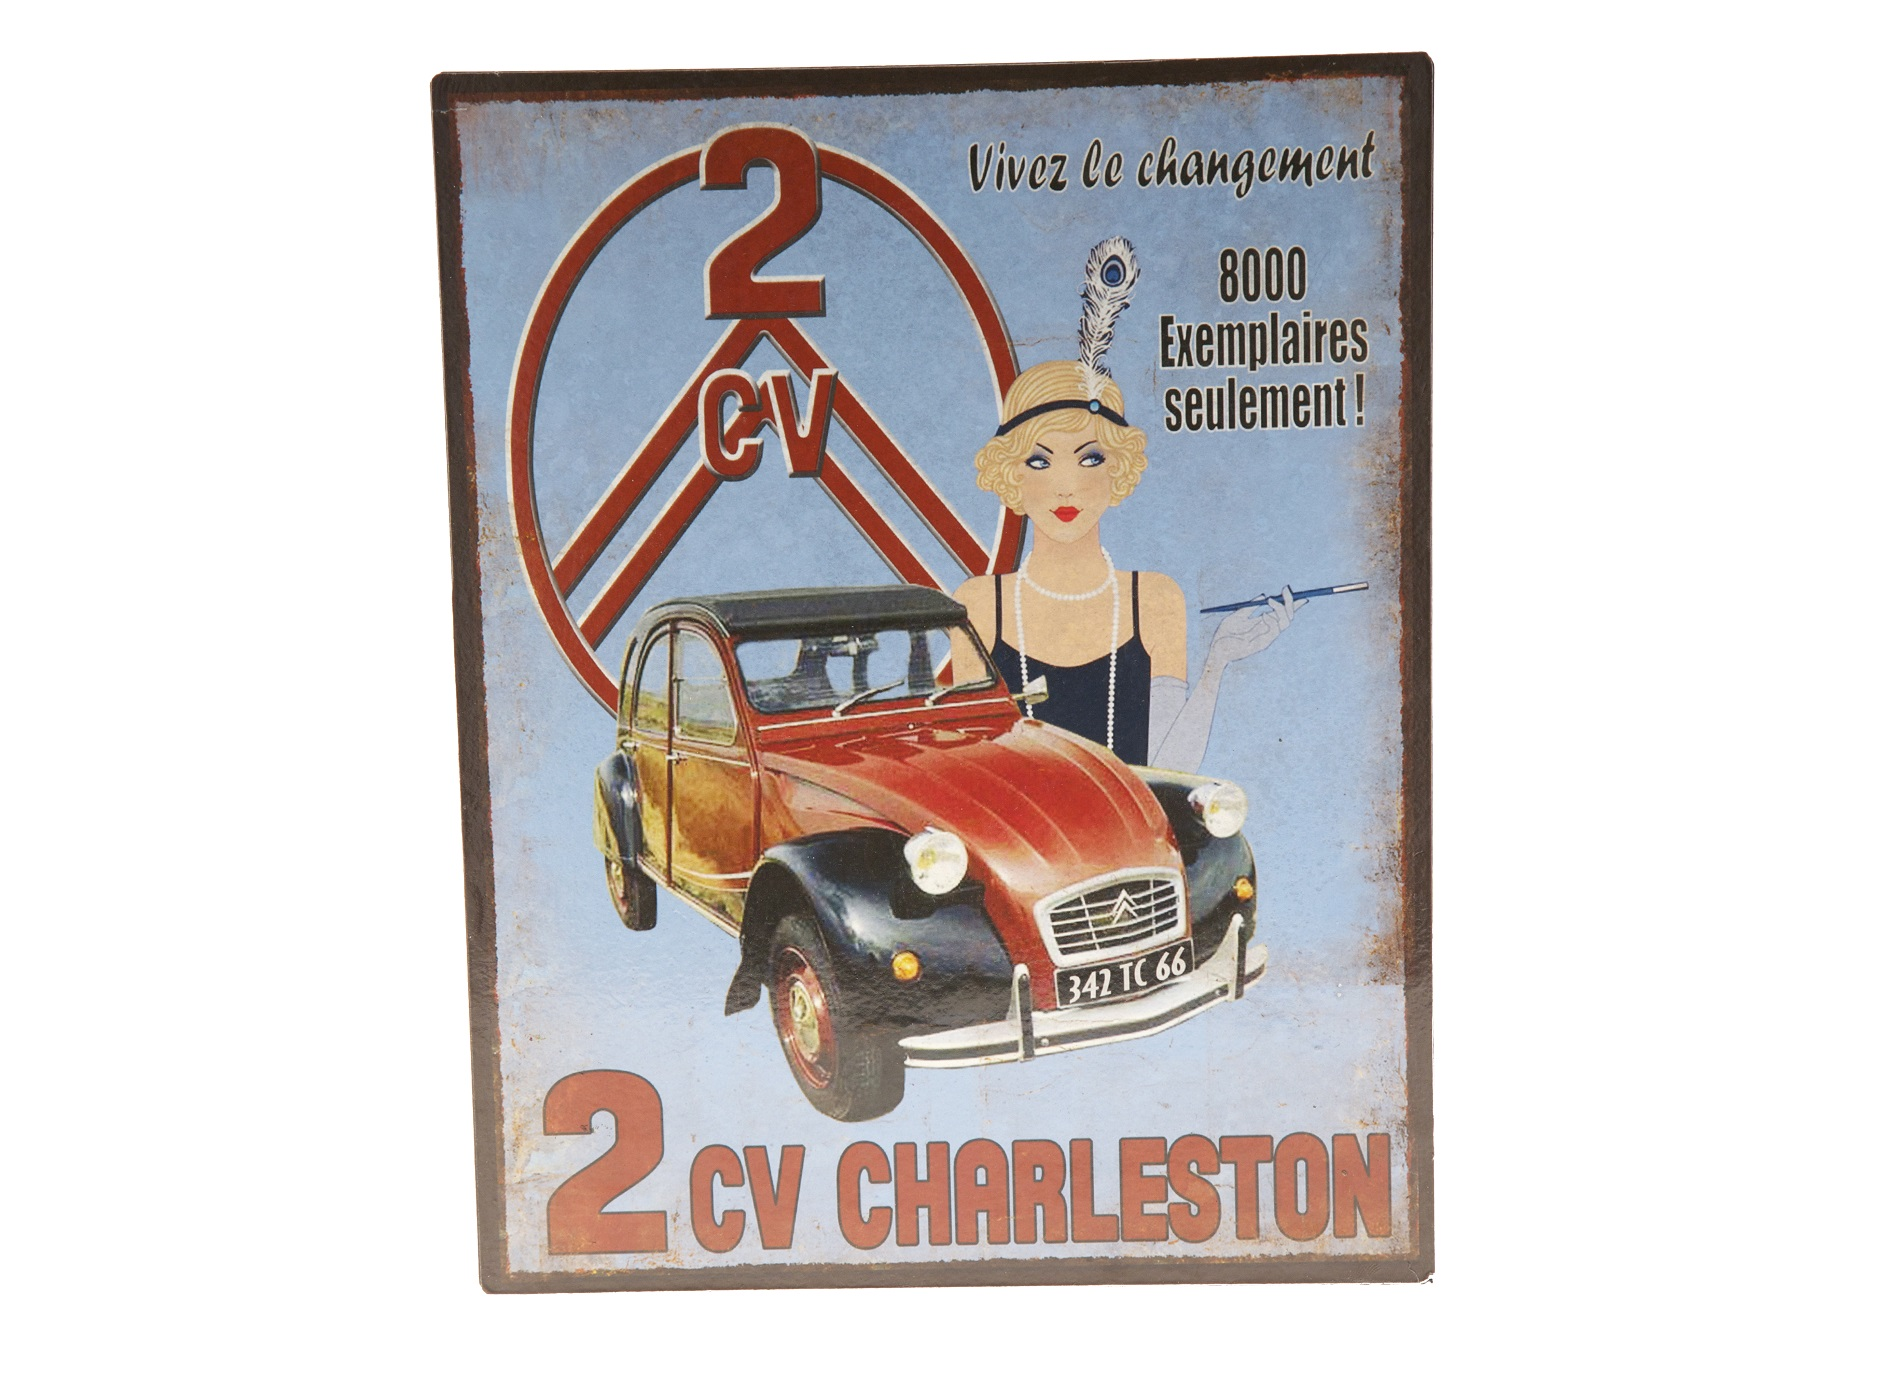 Табличка Cv CharlestoneДругое<br><br><br>Material: Железо<br>Length см: None<br>Width см: 24.2<br>Depth см: 3<br>Height см: 30.8